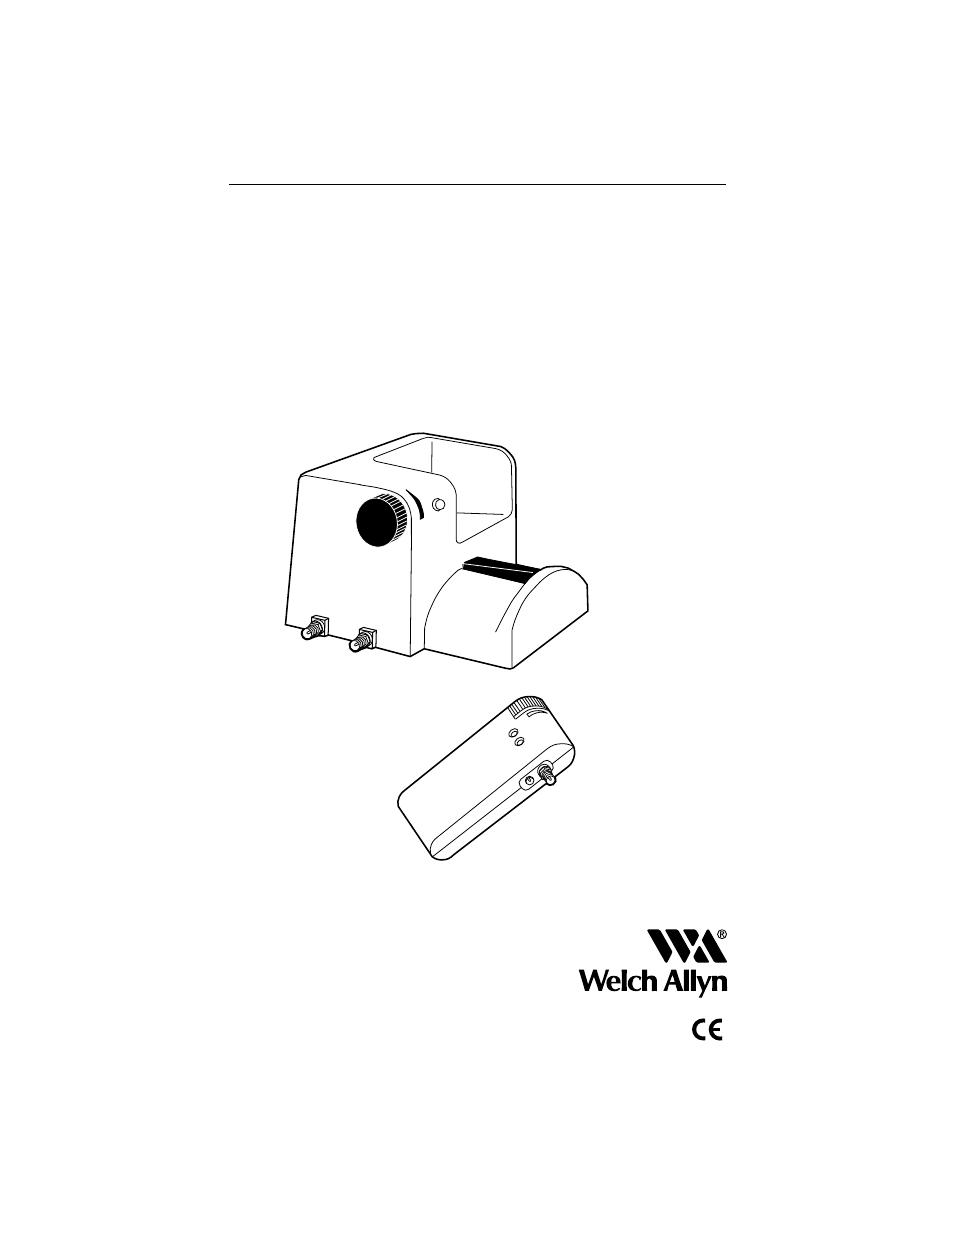 Welch Allyn 12500 Binocular Indirect Ophthalmoscope Power Source